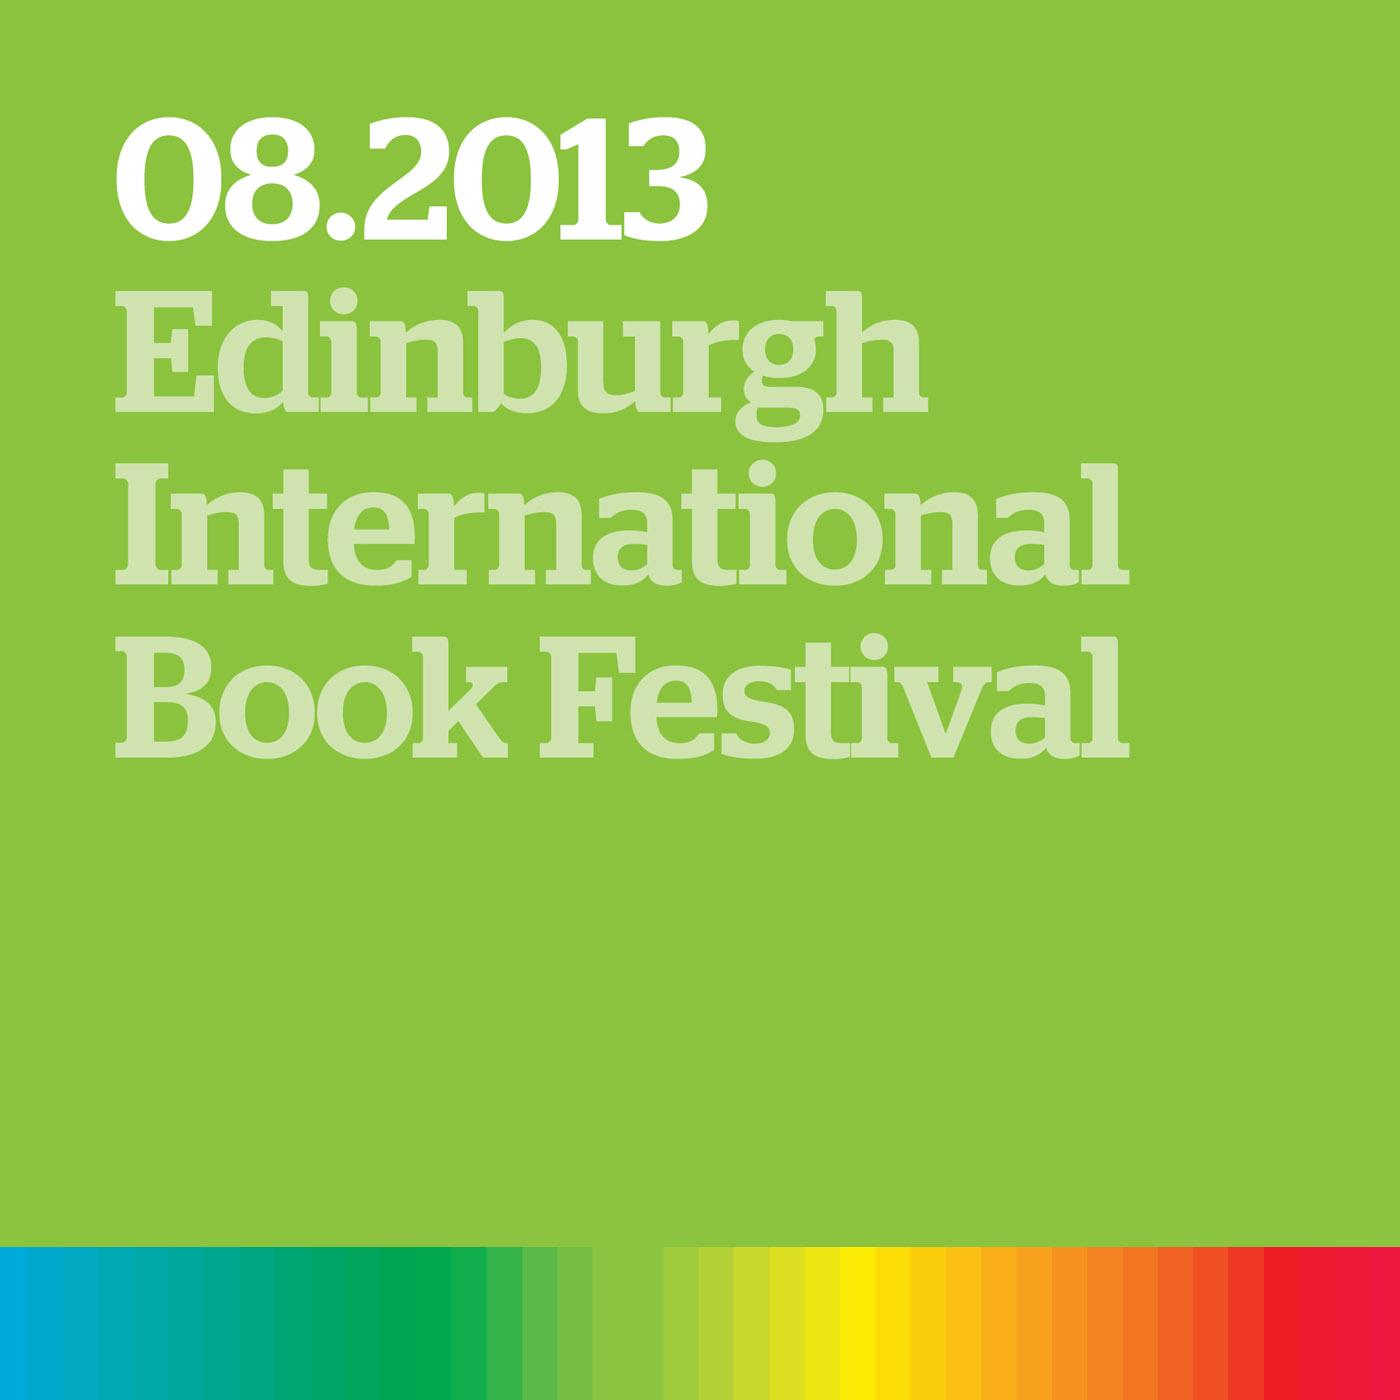 2013 Edinburgh International Book Festival